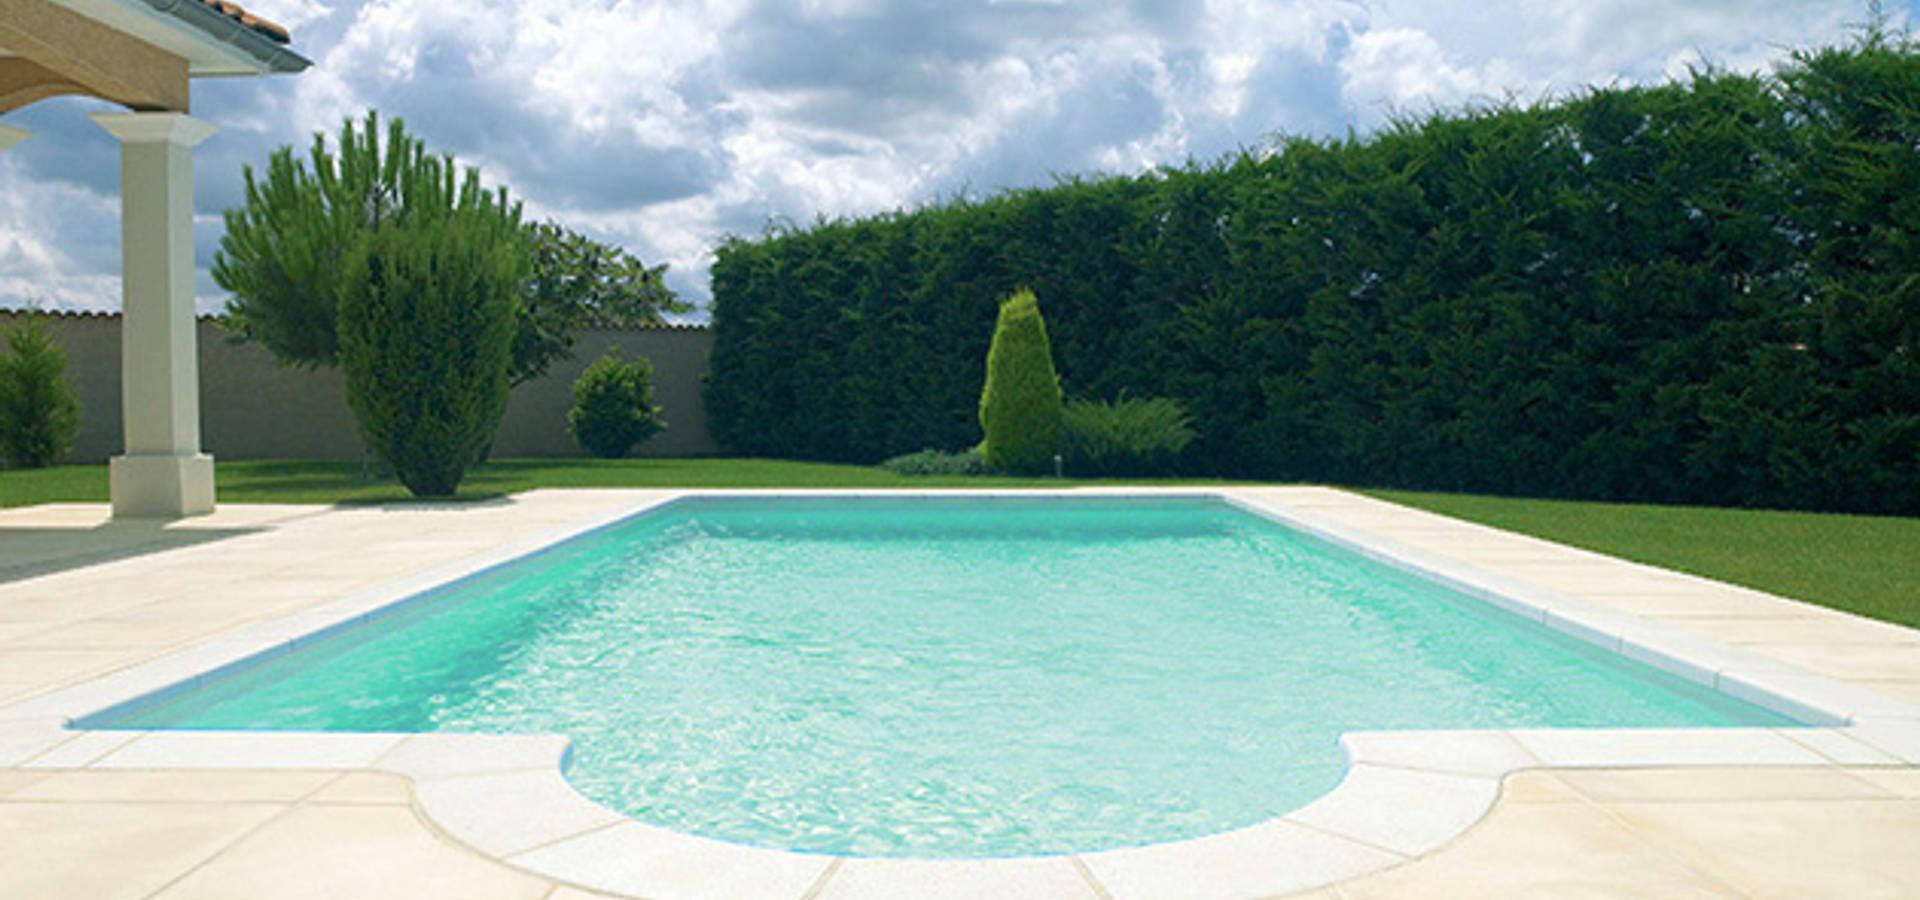 Piscine idromassaggio prettypool by bsvillage piscine homify for Piscine 62